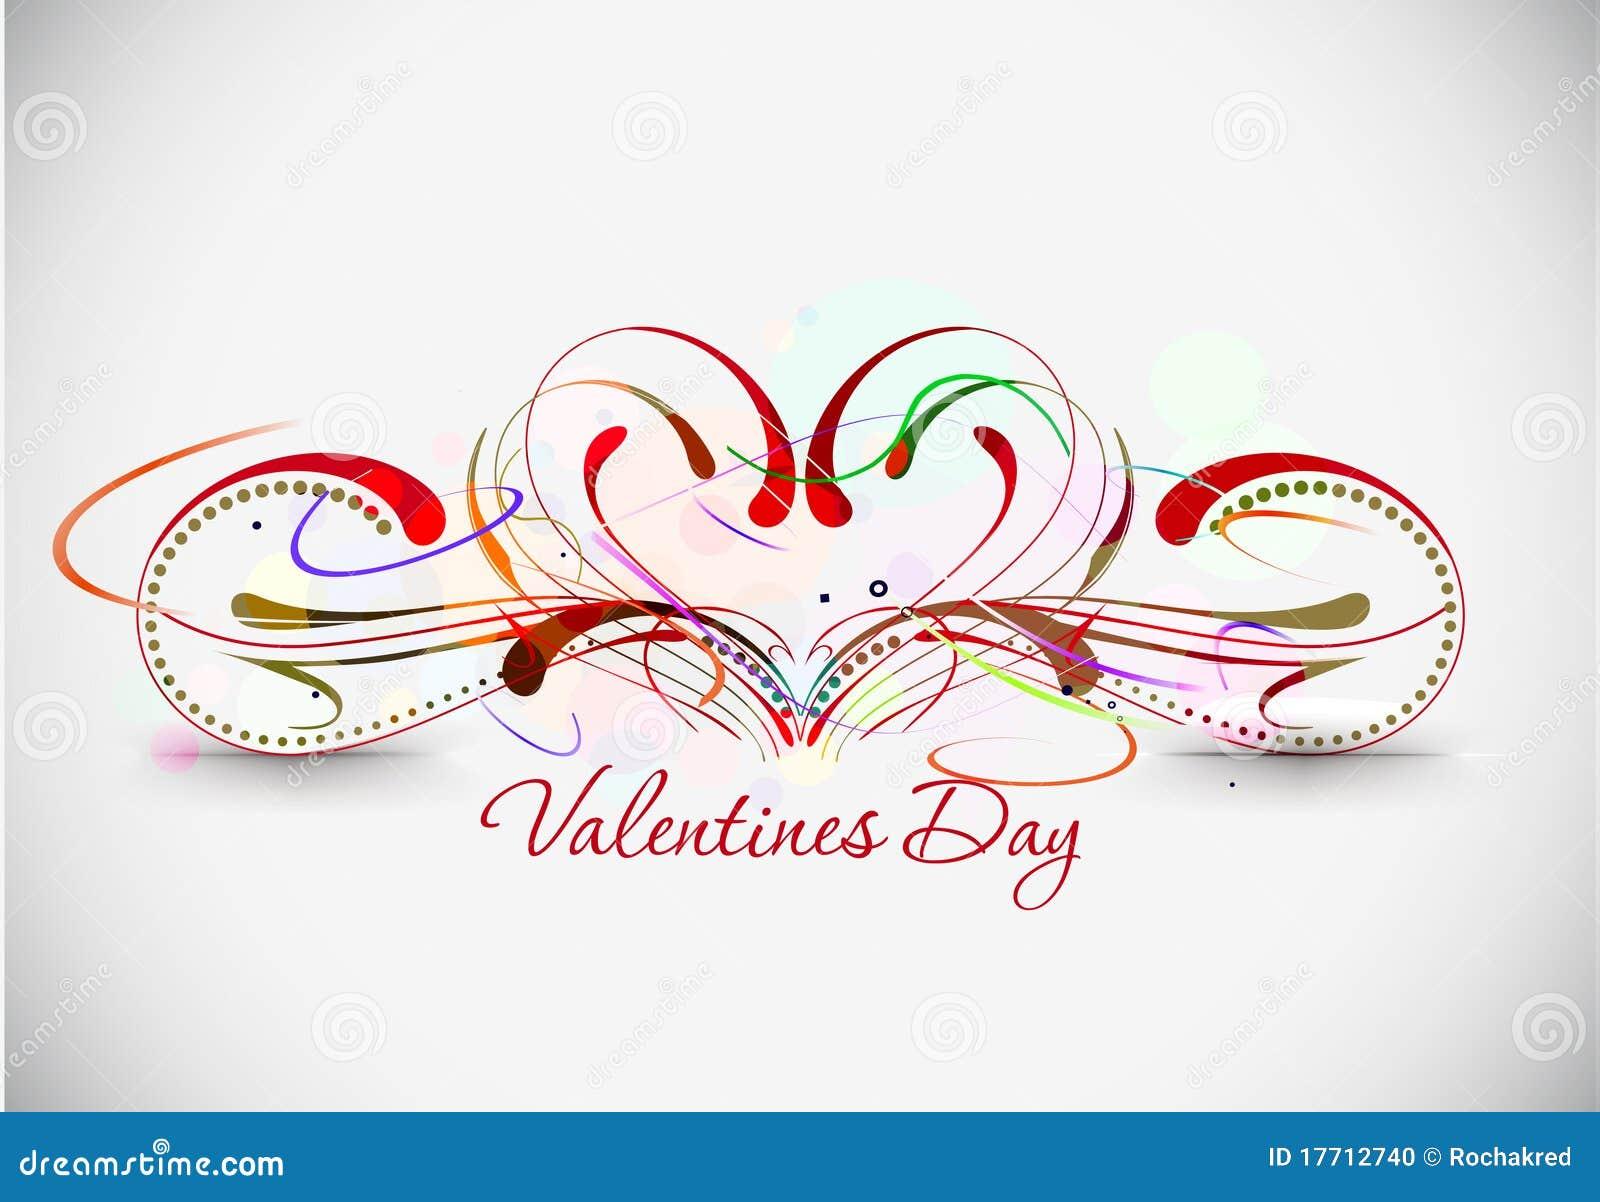 Valentines Day Floral Design Stock Vector Illustration Of